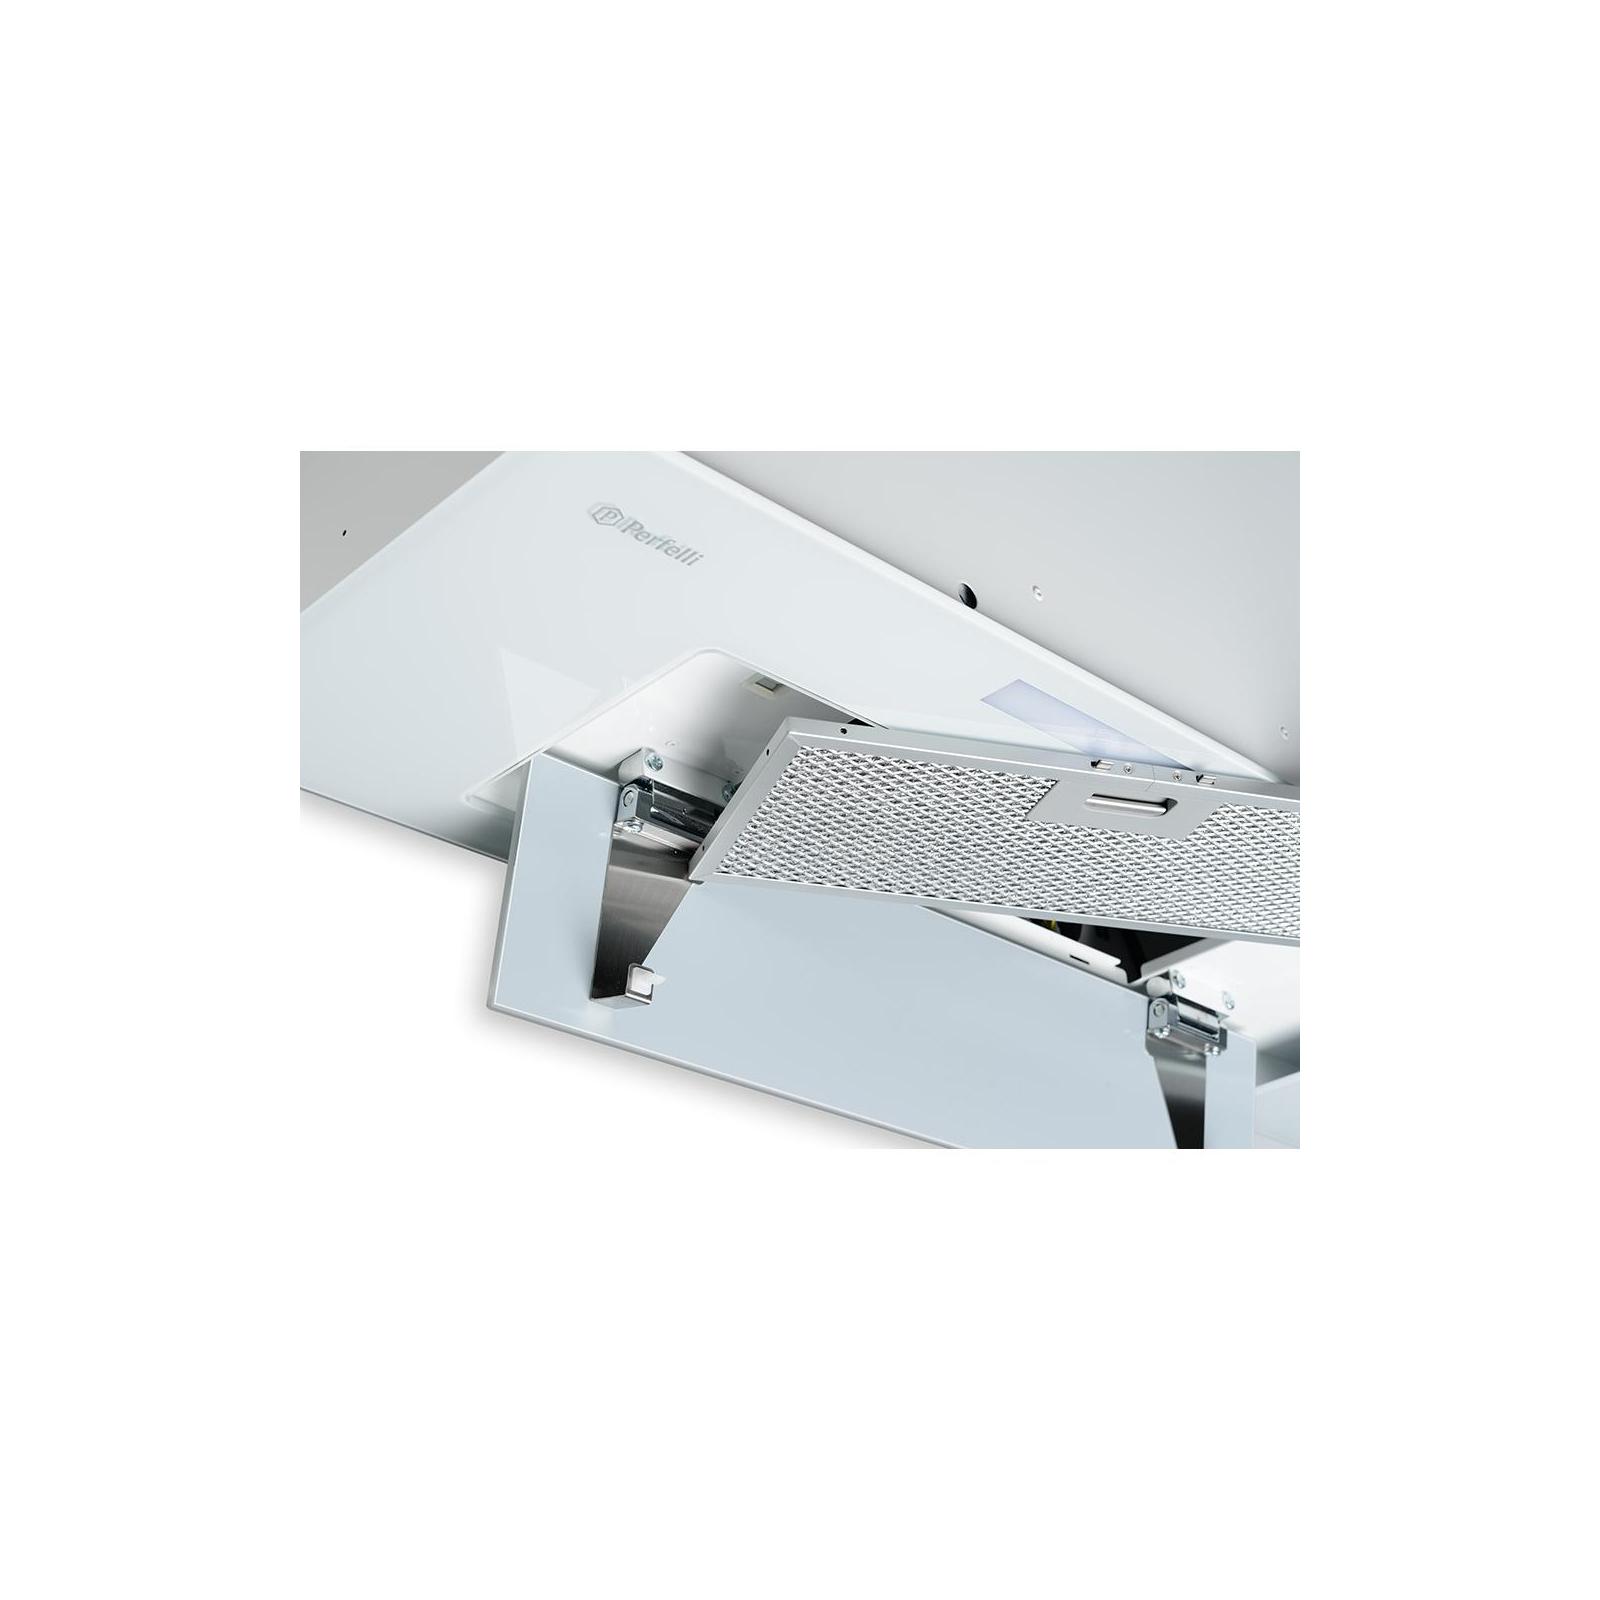 Вытяжка кухонная PERFELLI BISP 9973 A 1250 W LED Strip изображение 7